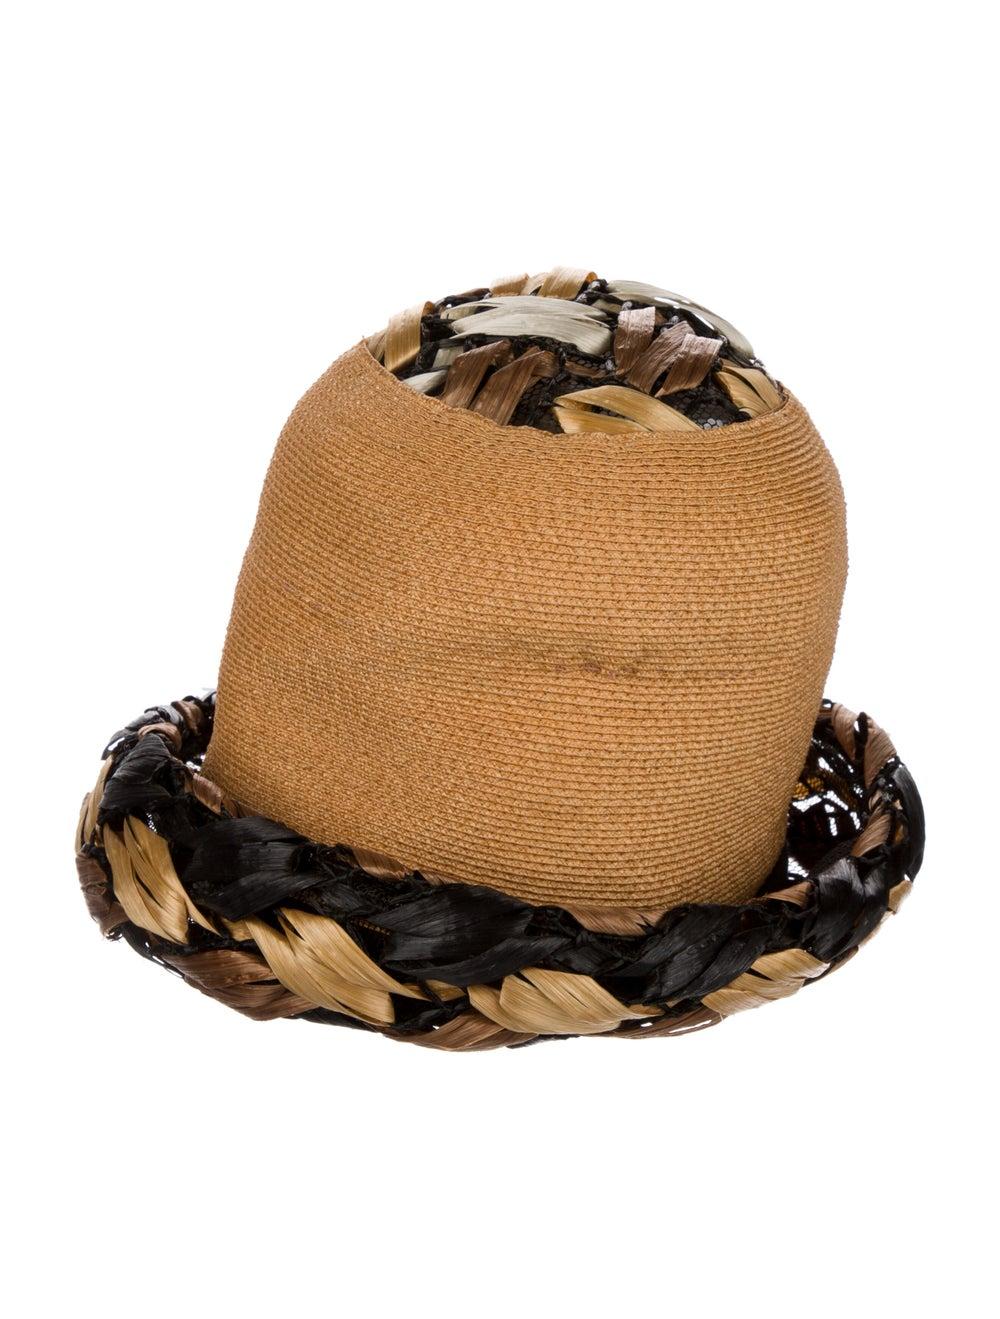 Christian Dior Vintage Straw Hat tan - image 2